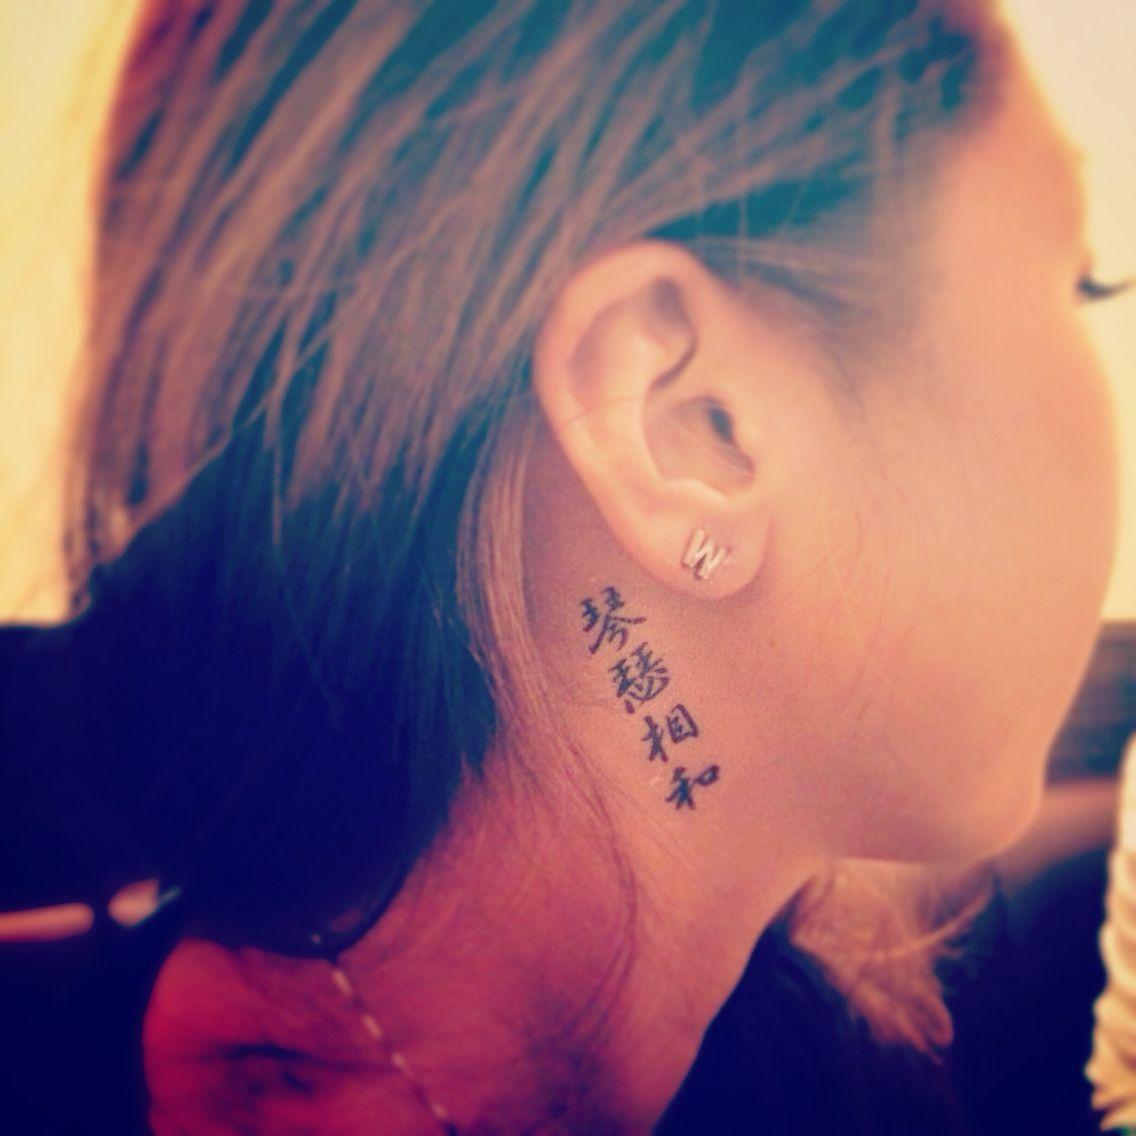 Japanese Kanji Tattoo Kinshitsusowa A Very Close And Affectionate Relationship Between A Married Couple Sib Relationship Tattoos Kanji Tattoo Couple Tattoos